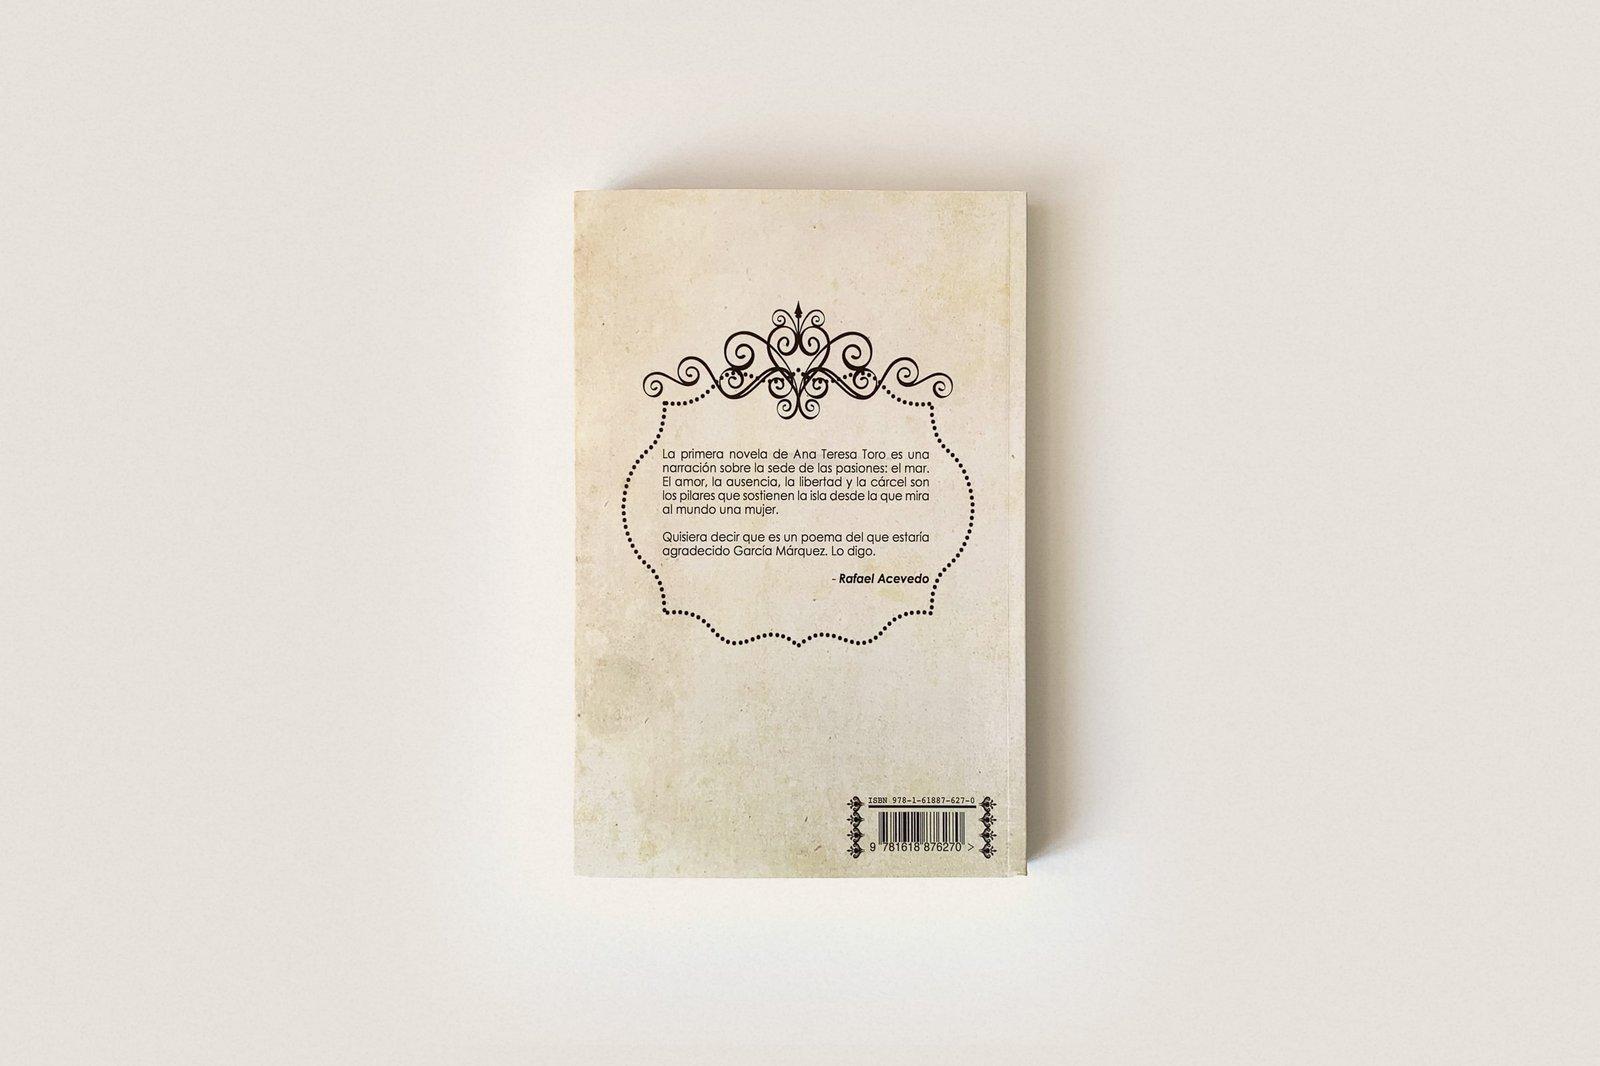 Libro: Cartas al agua — Ana Teresa Toro